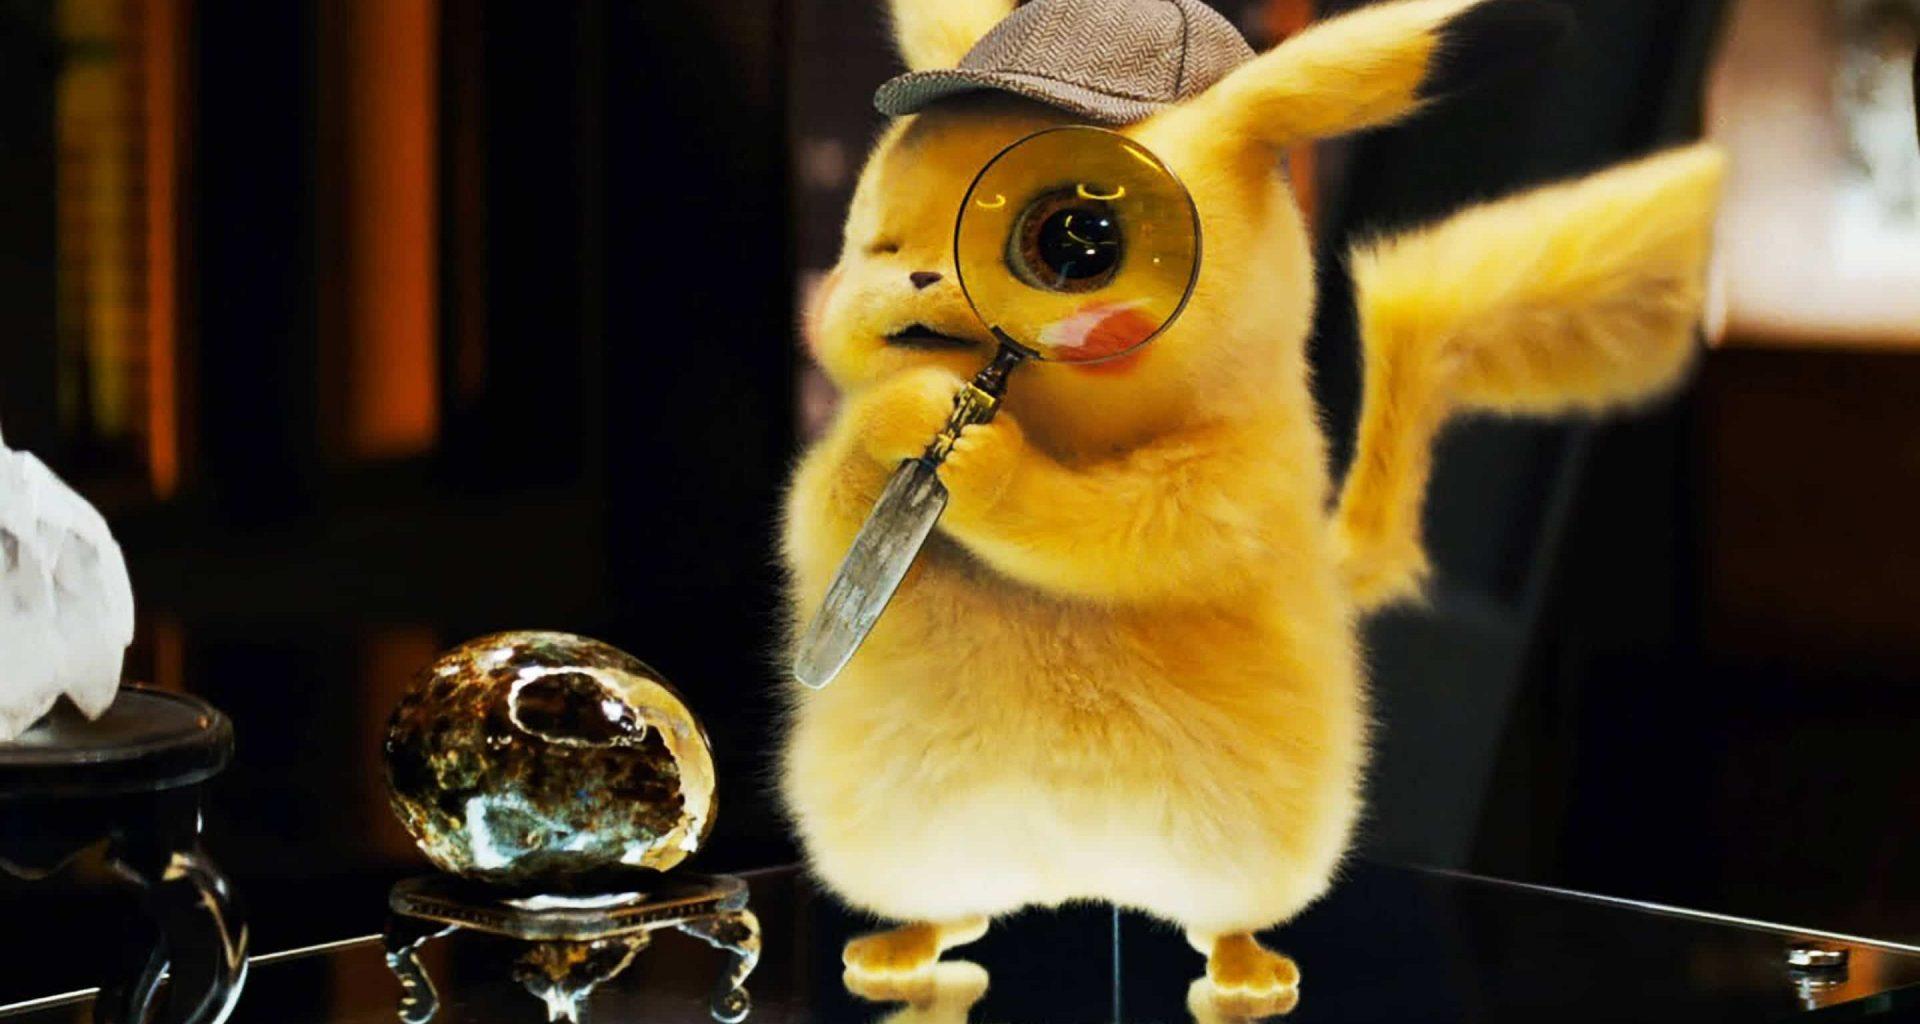 detective pikachu 16x9